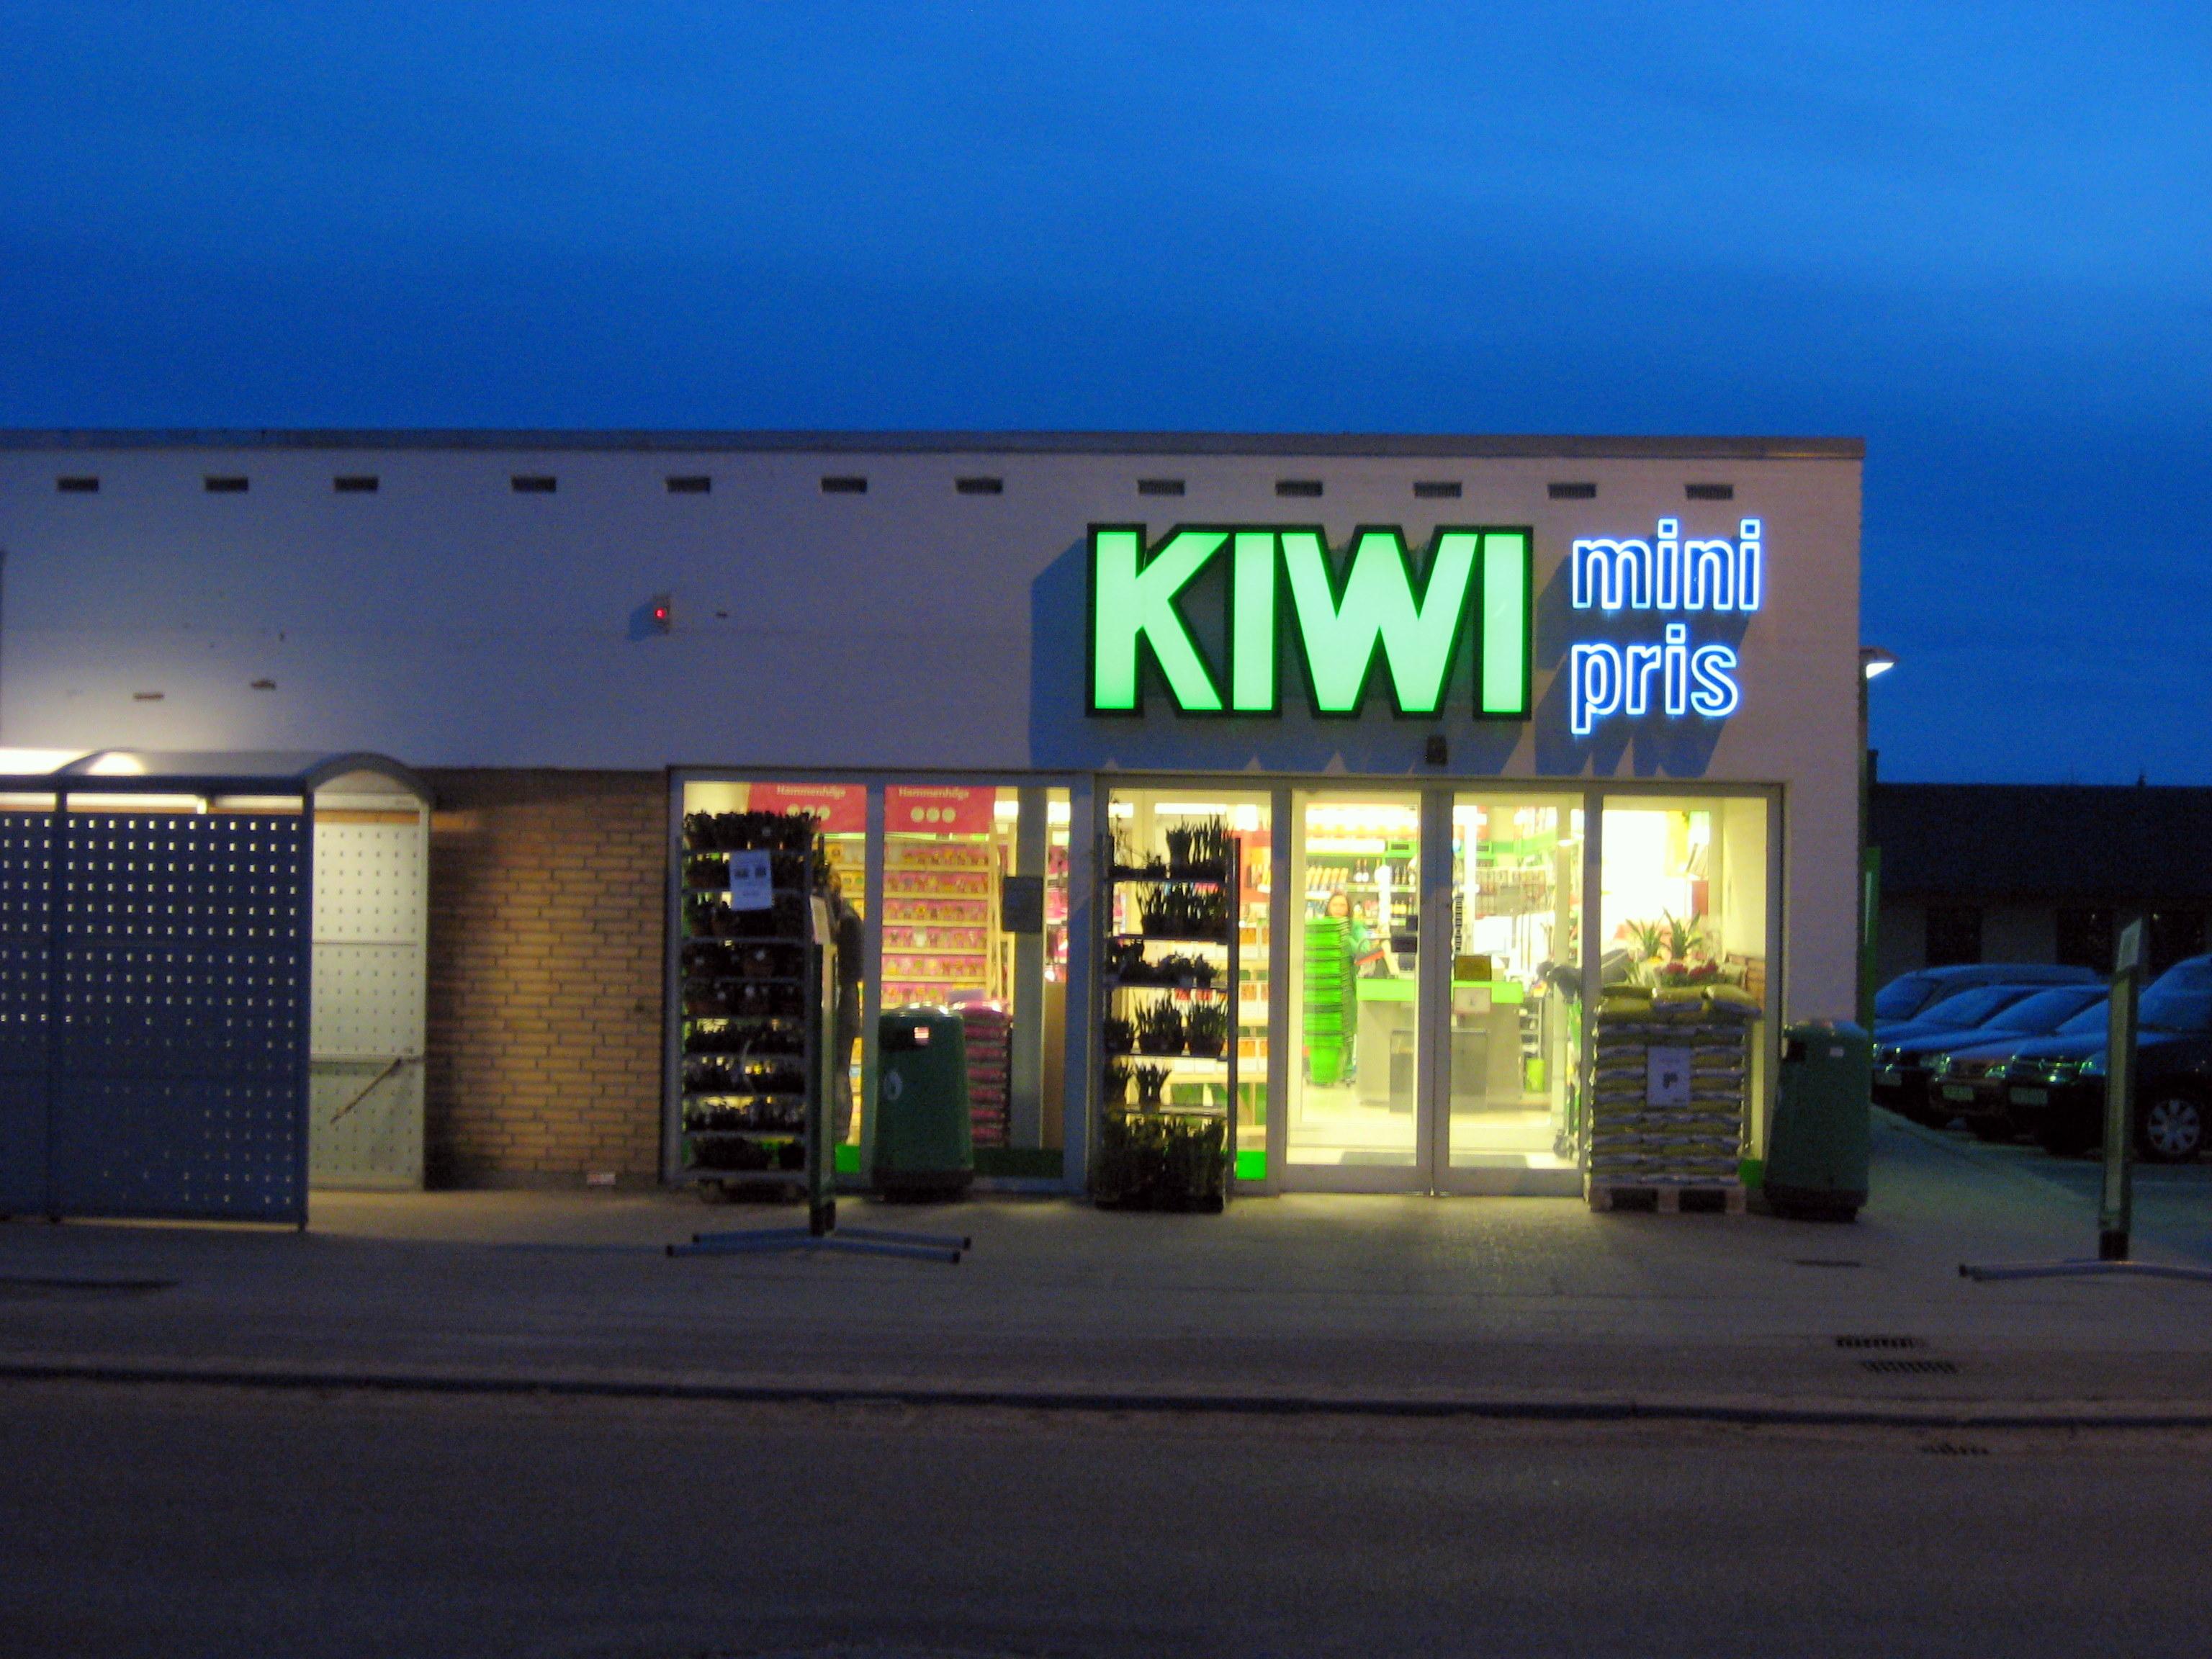 fakta om kiwi